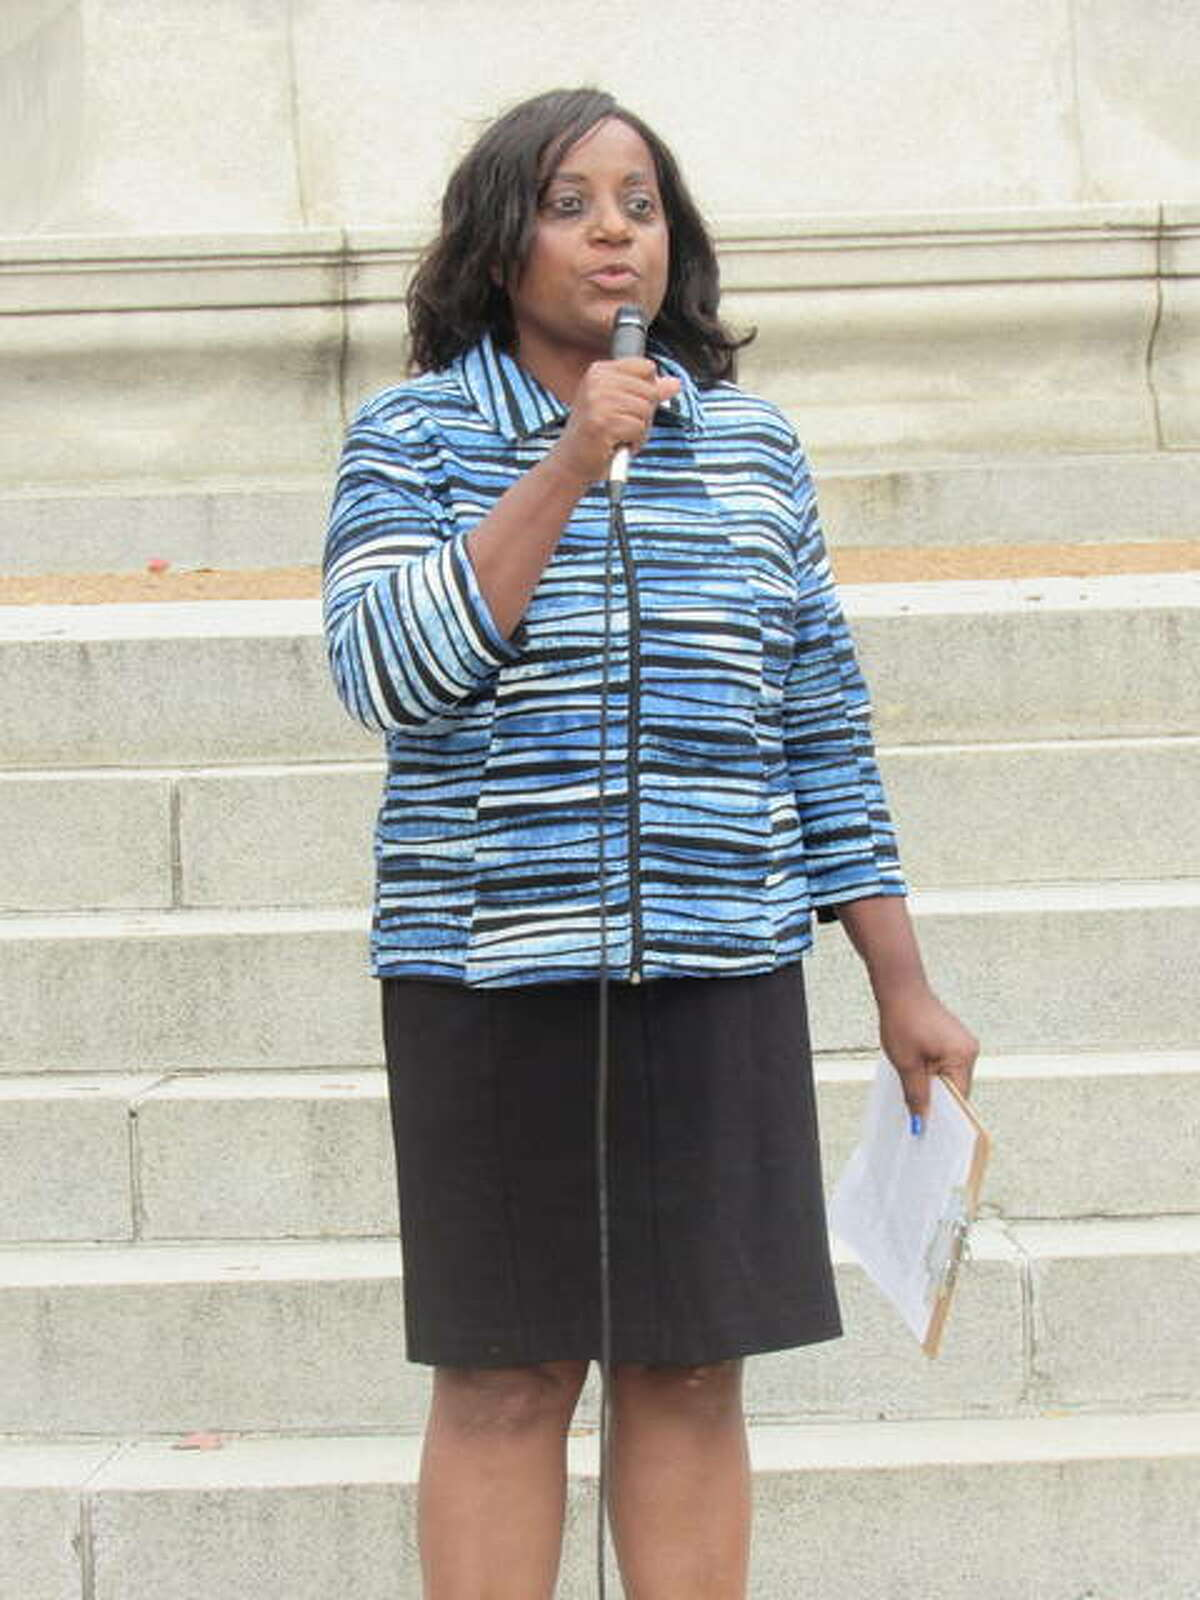 Alton School Board Member Rosetta Brown addresses the Lovejoy Memorial ceremony Monday in Alton.